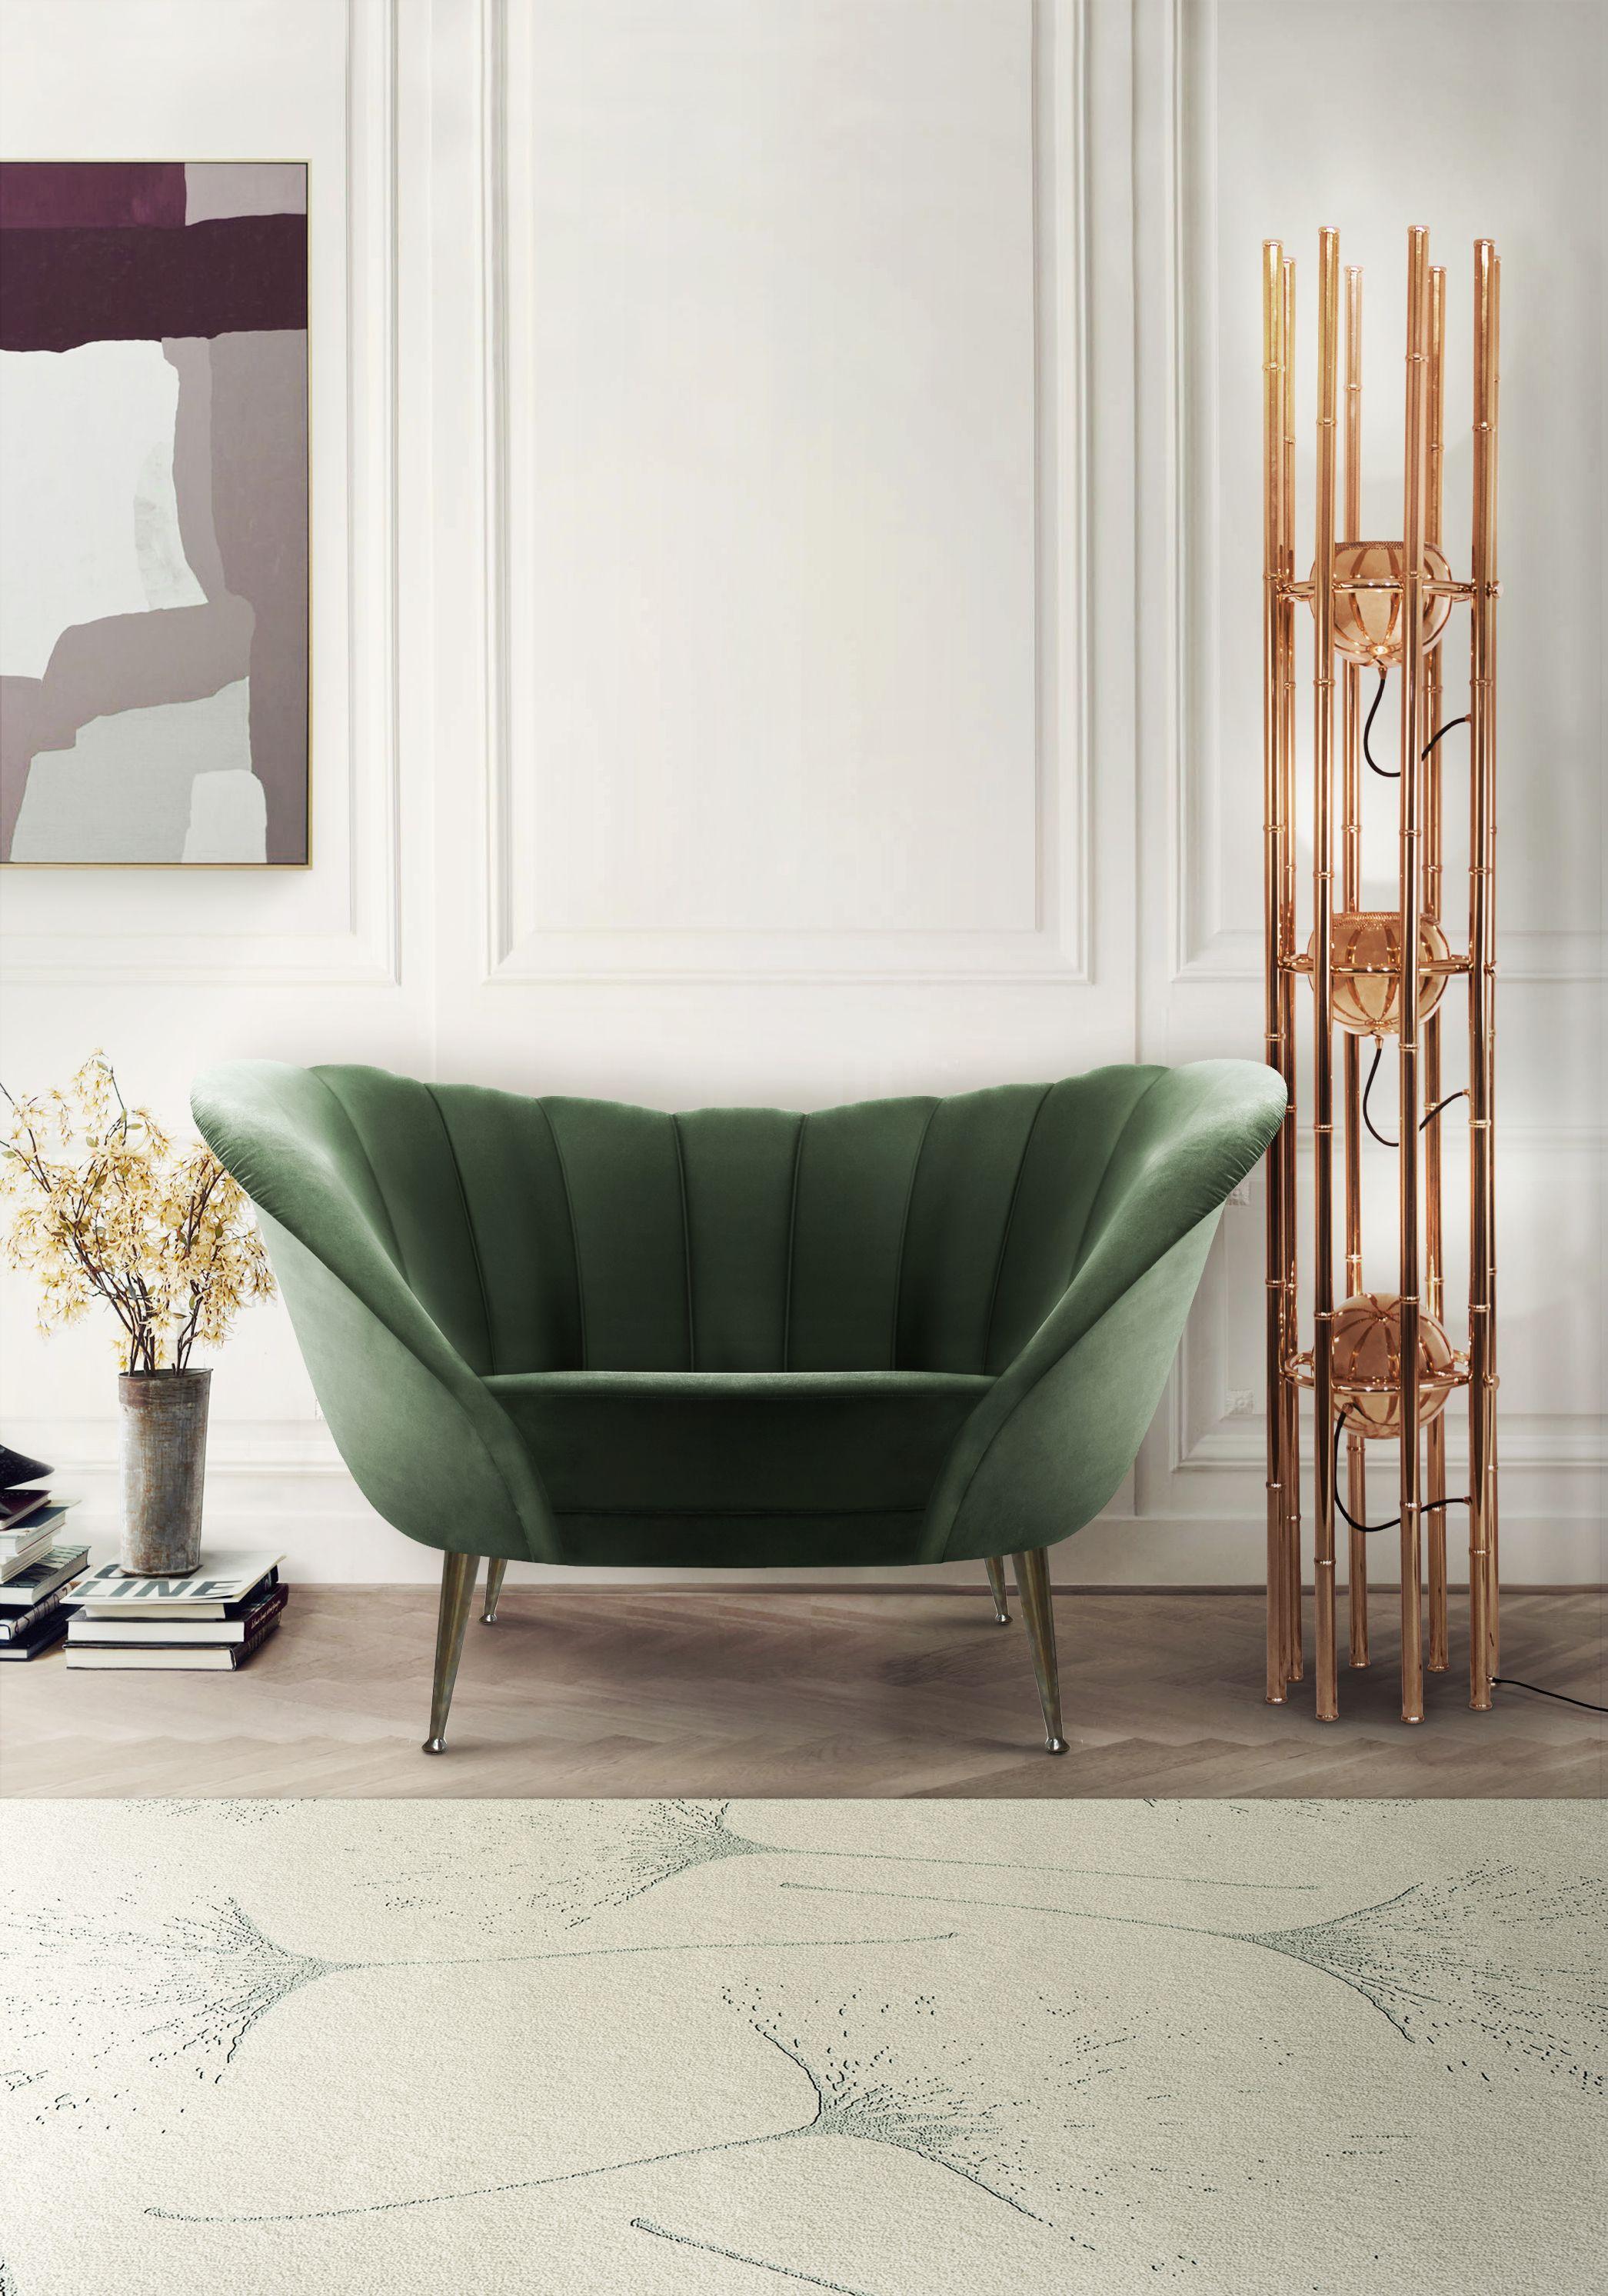 sofa modernos 2017 bernhardt furniture 10 smashing green velvet armchair designs that you will covet muebles sillas modernas